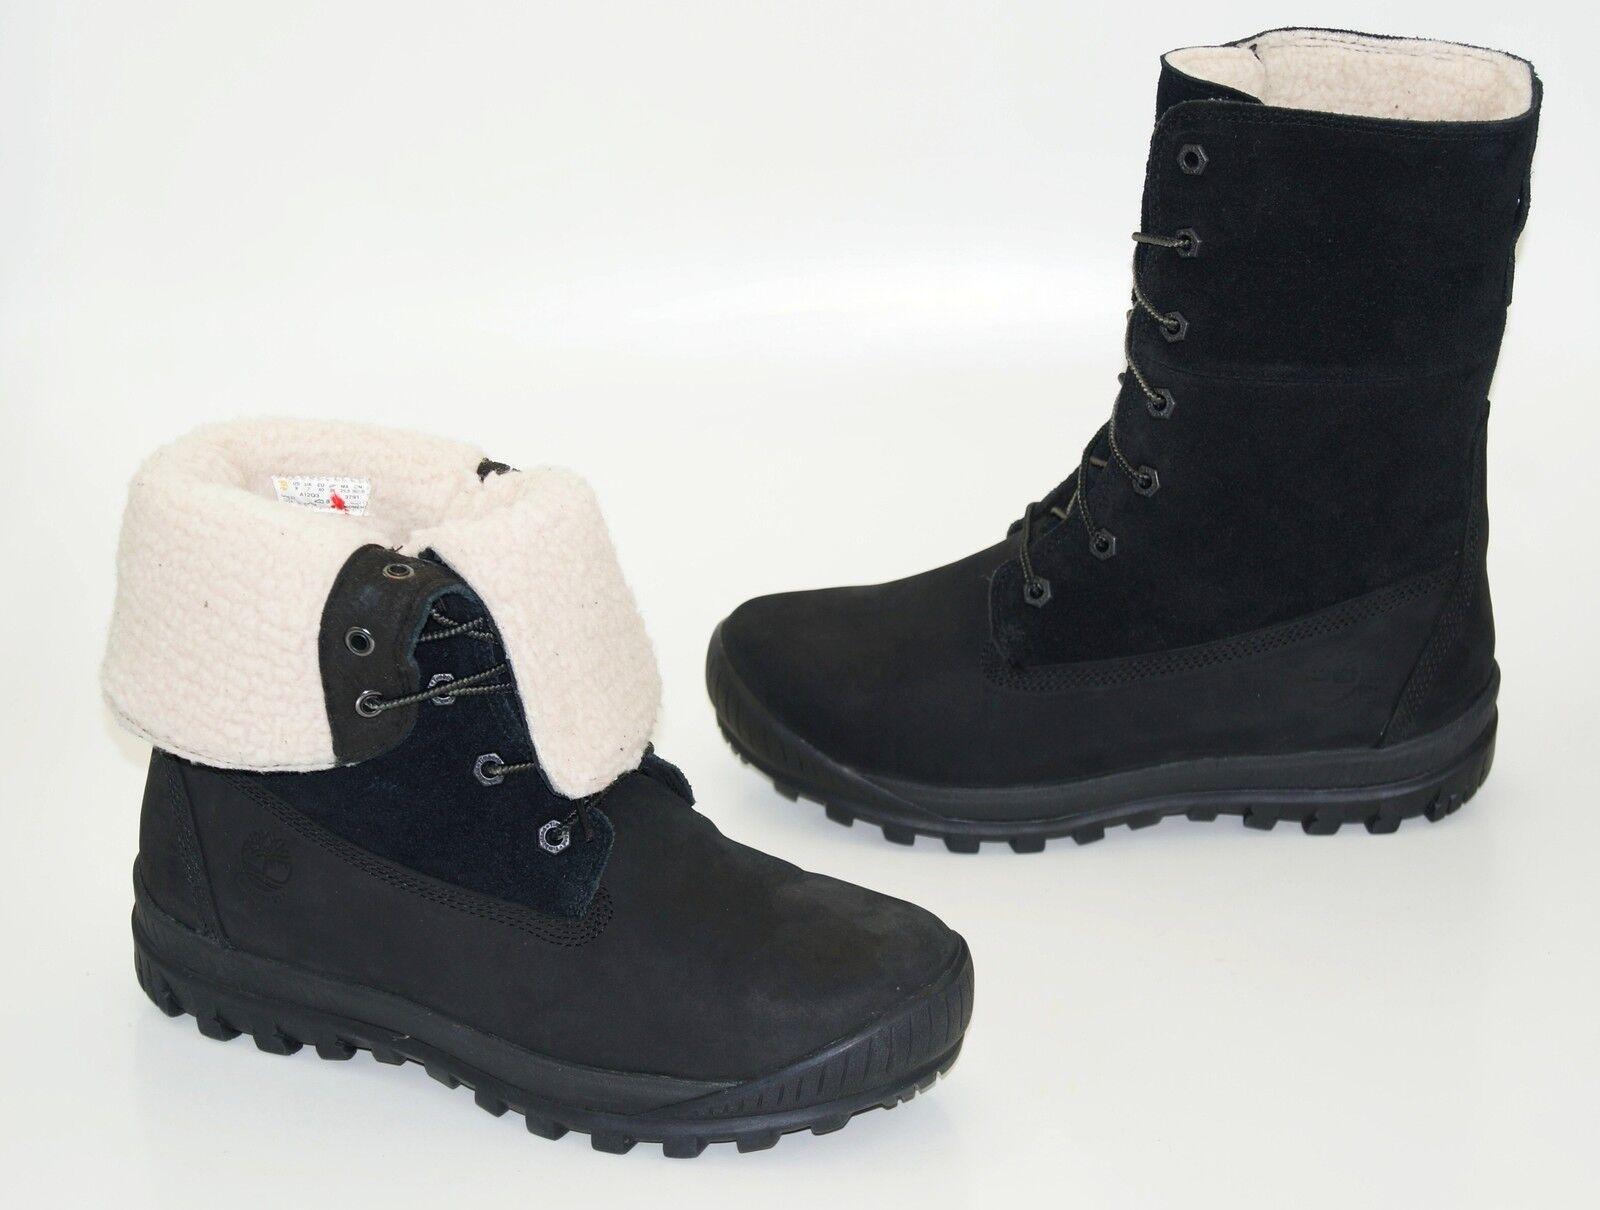 Timberland WOODHAVEN FLEECE ROLL-DOWN Boots Waterproof Damen Winter Stiefel NEU